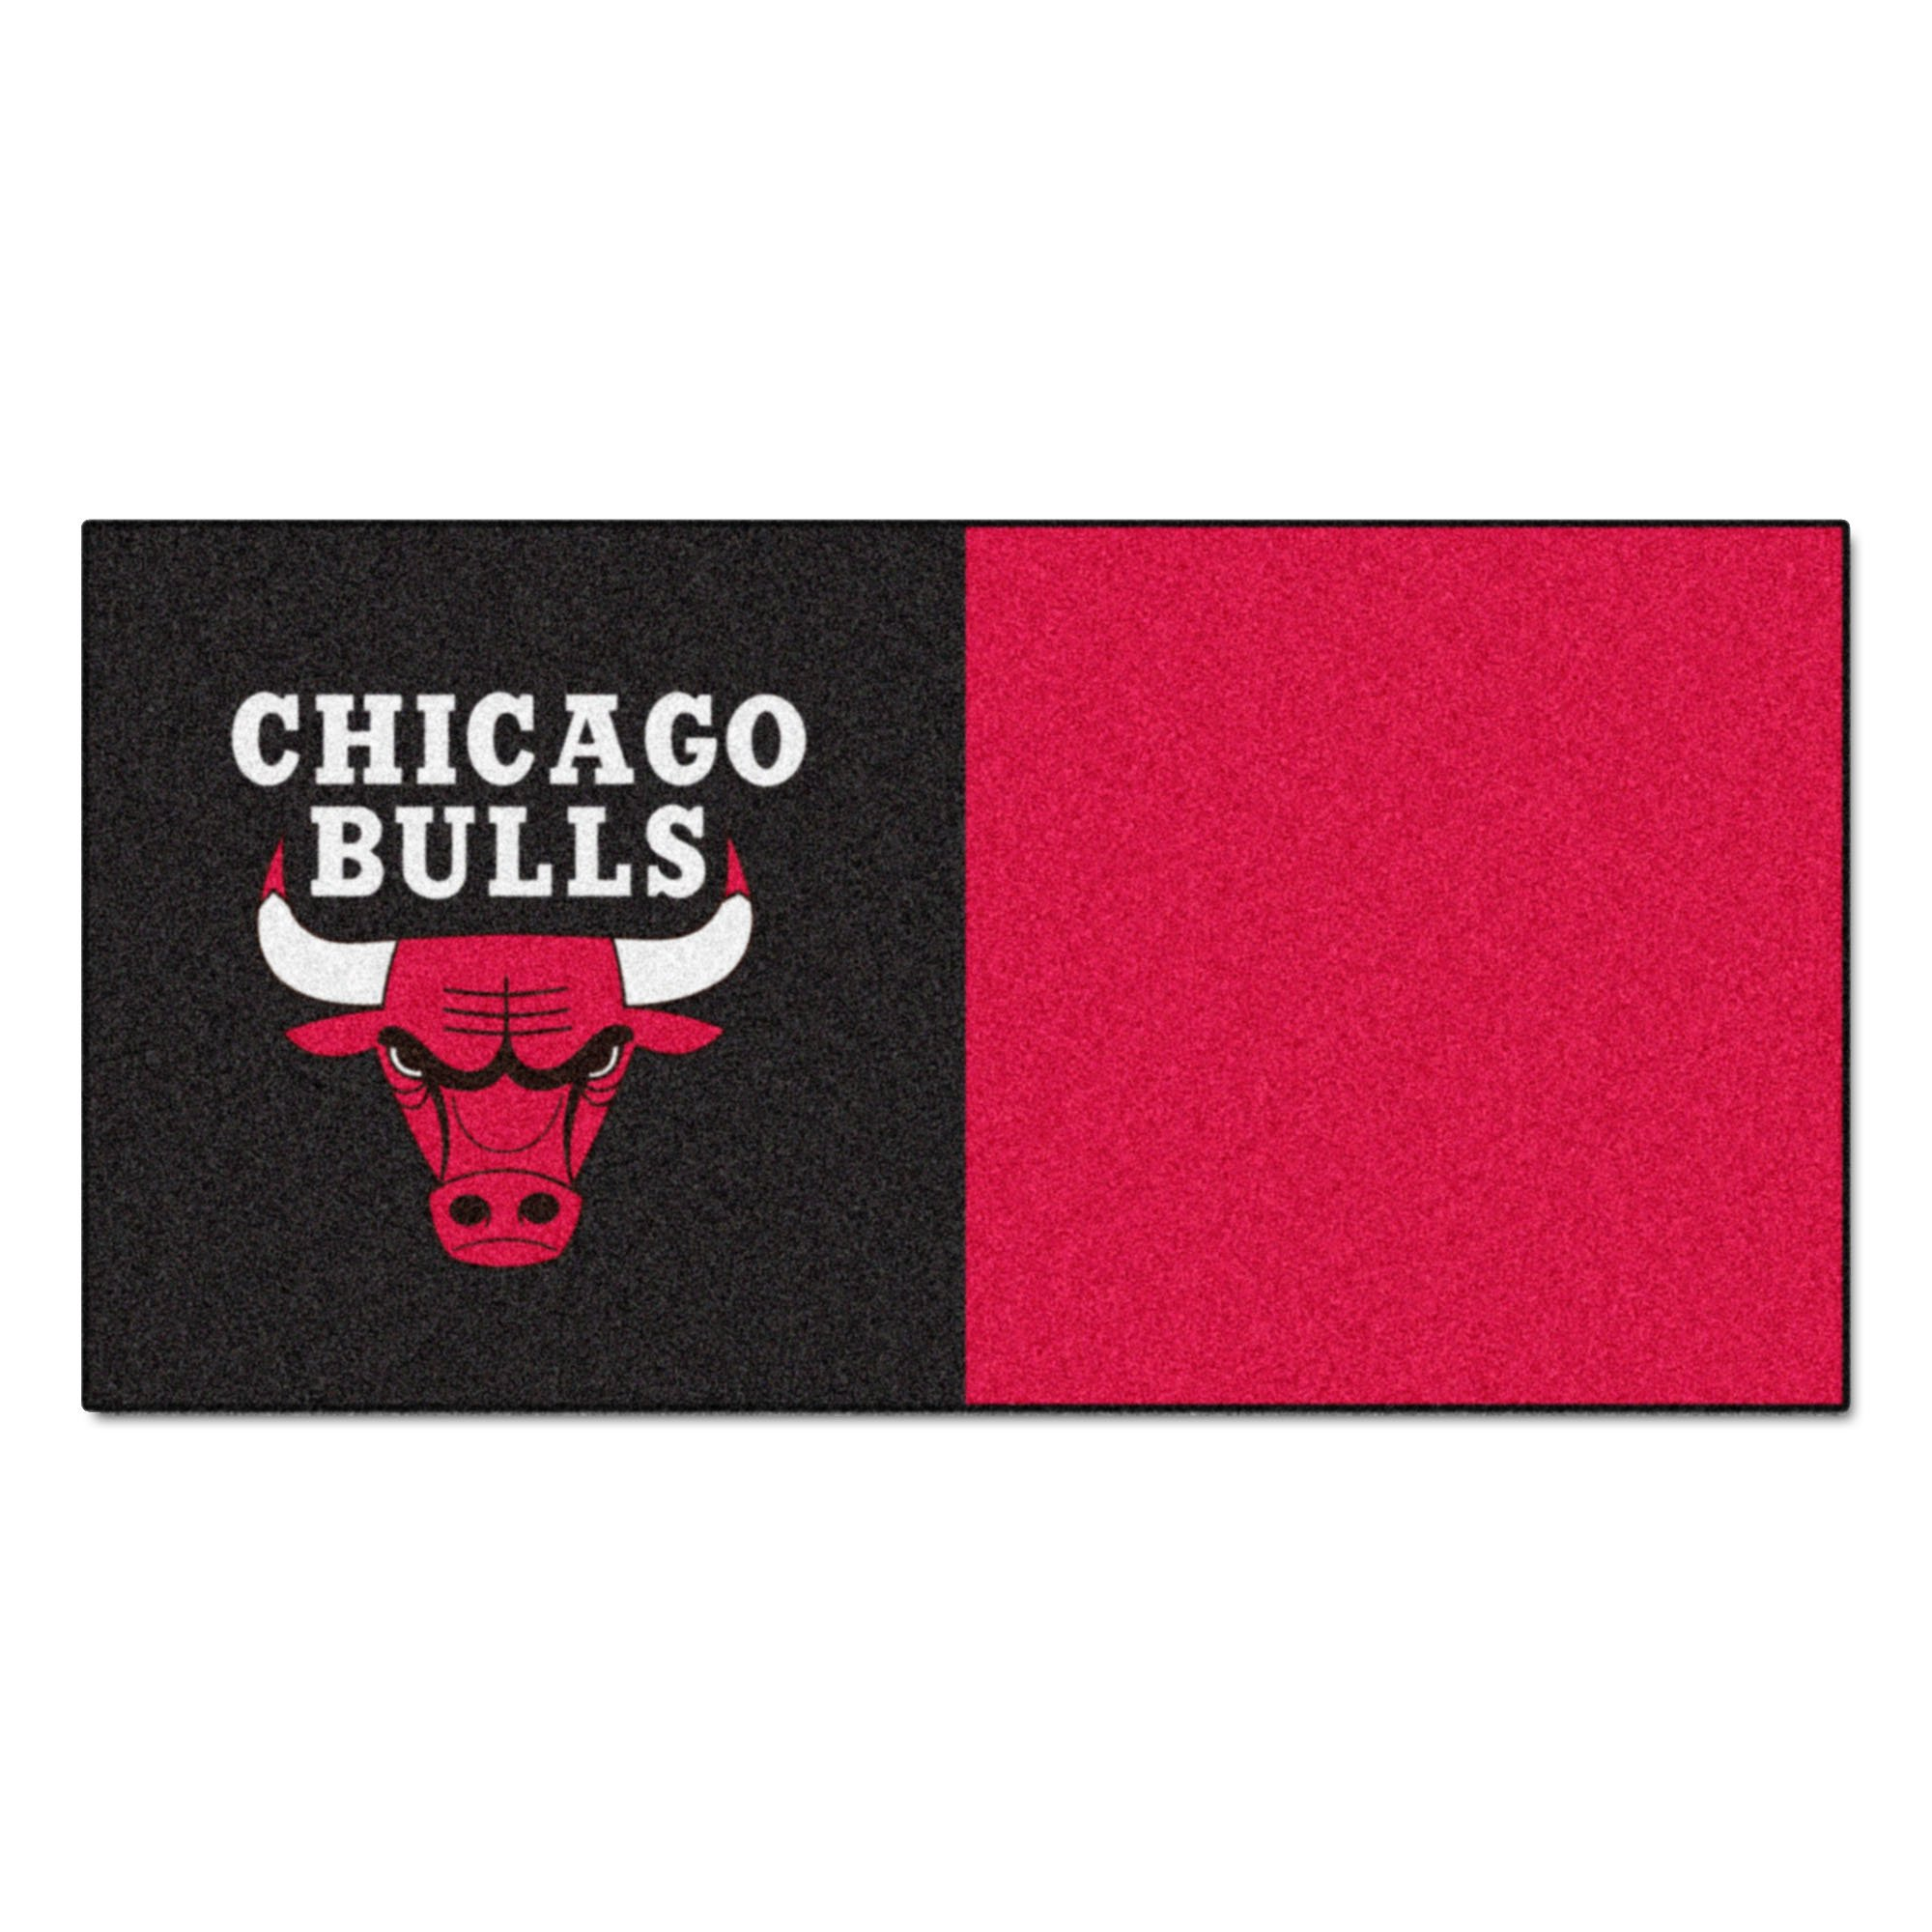 FANMATS NBA Chicago Bulls Nylon Face Team Carpet Tiles by Fanmats